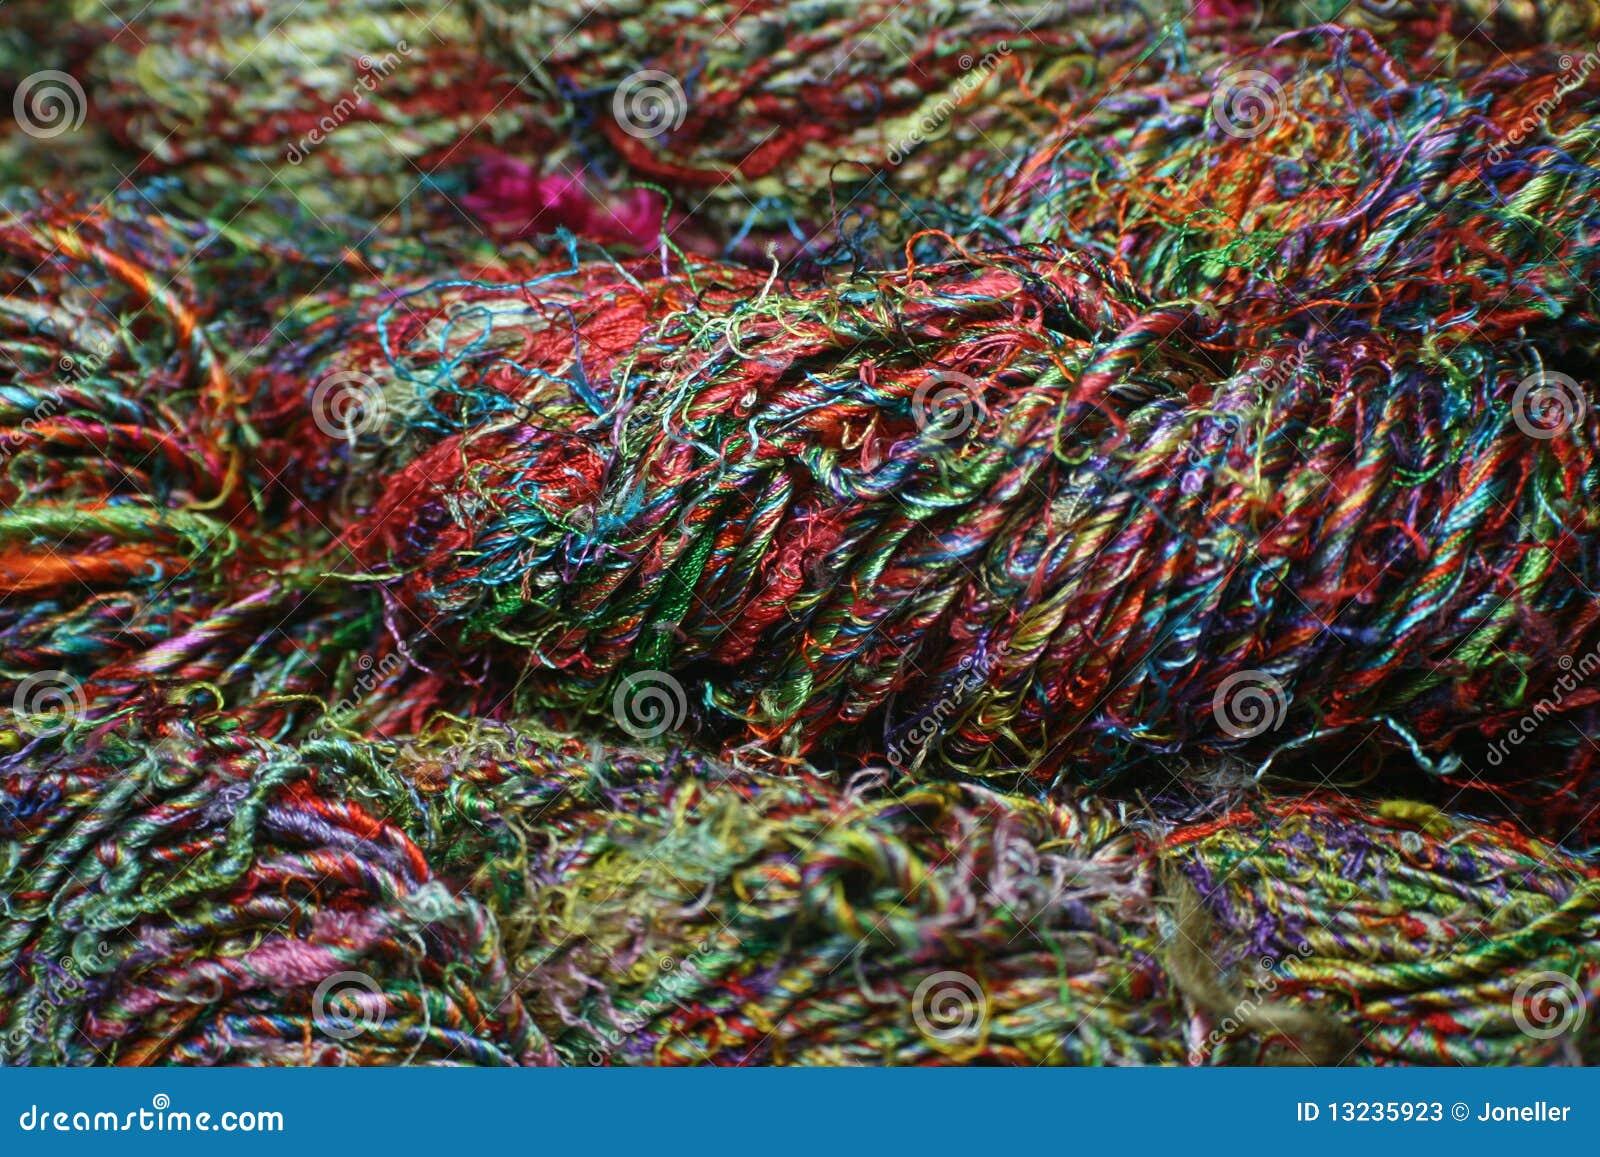 Sari Silk Yarn stock image  Image of sari, knit, natural